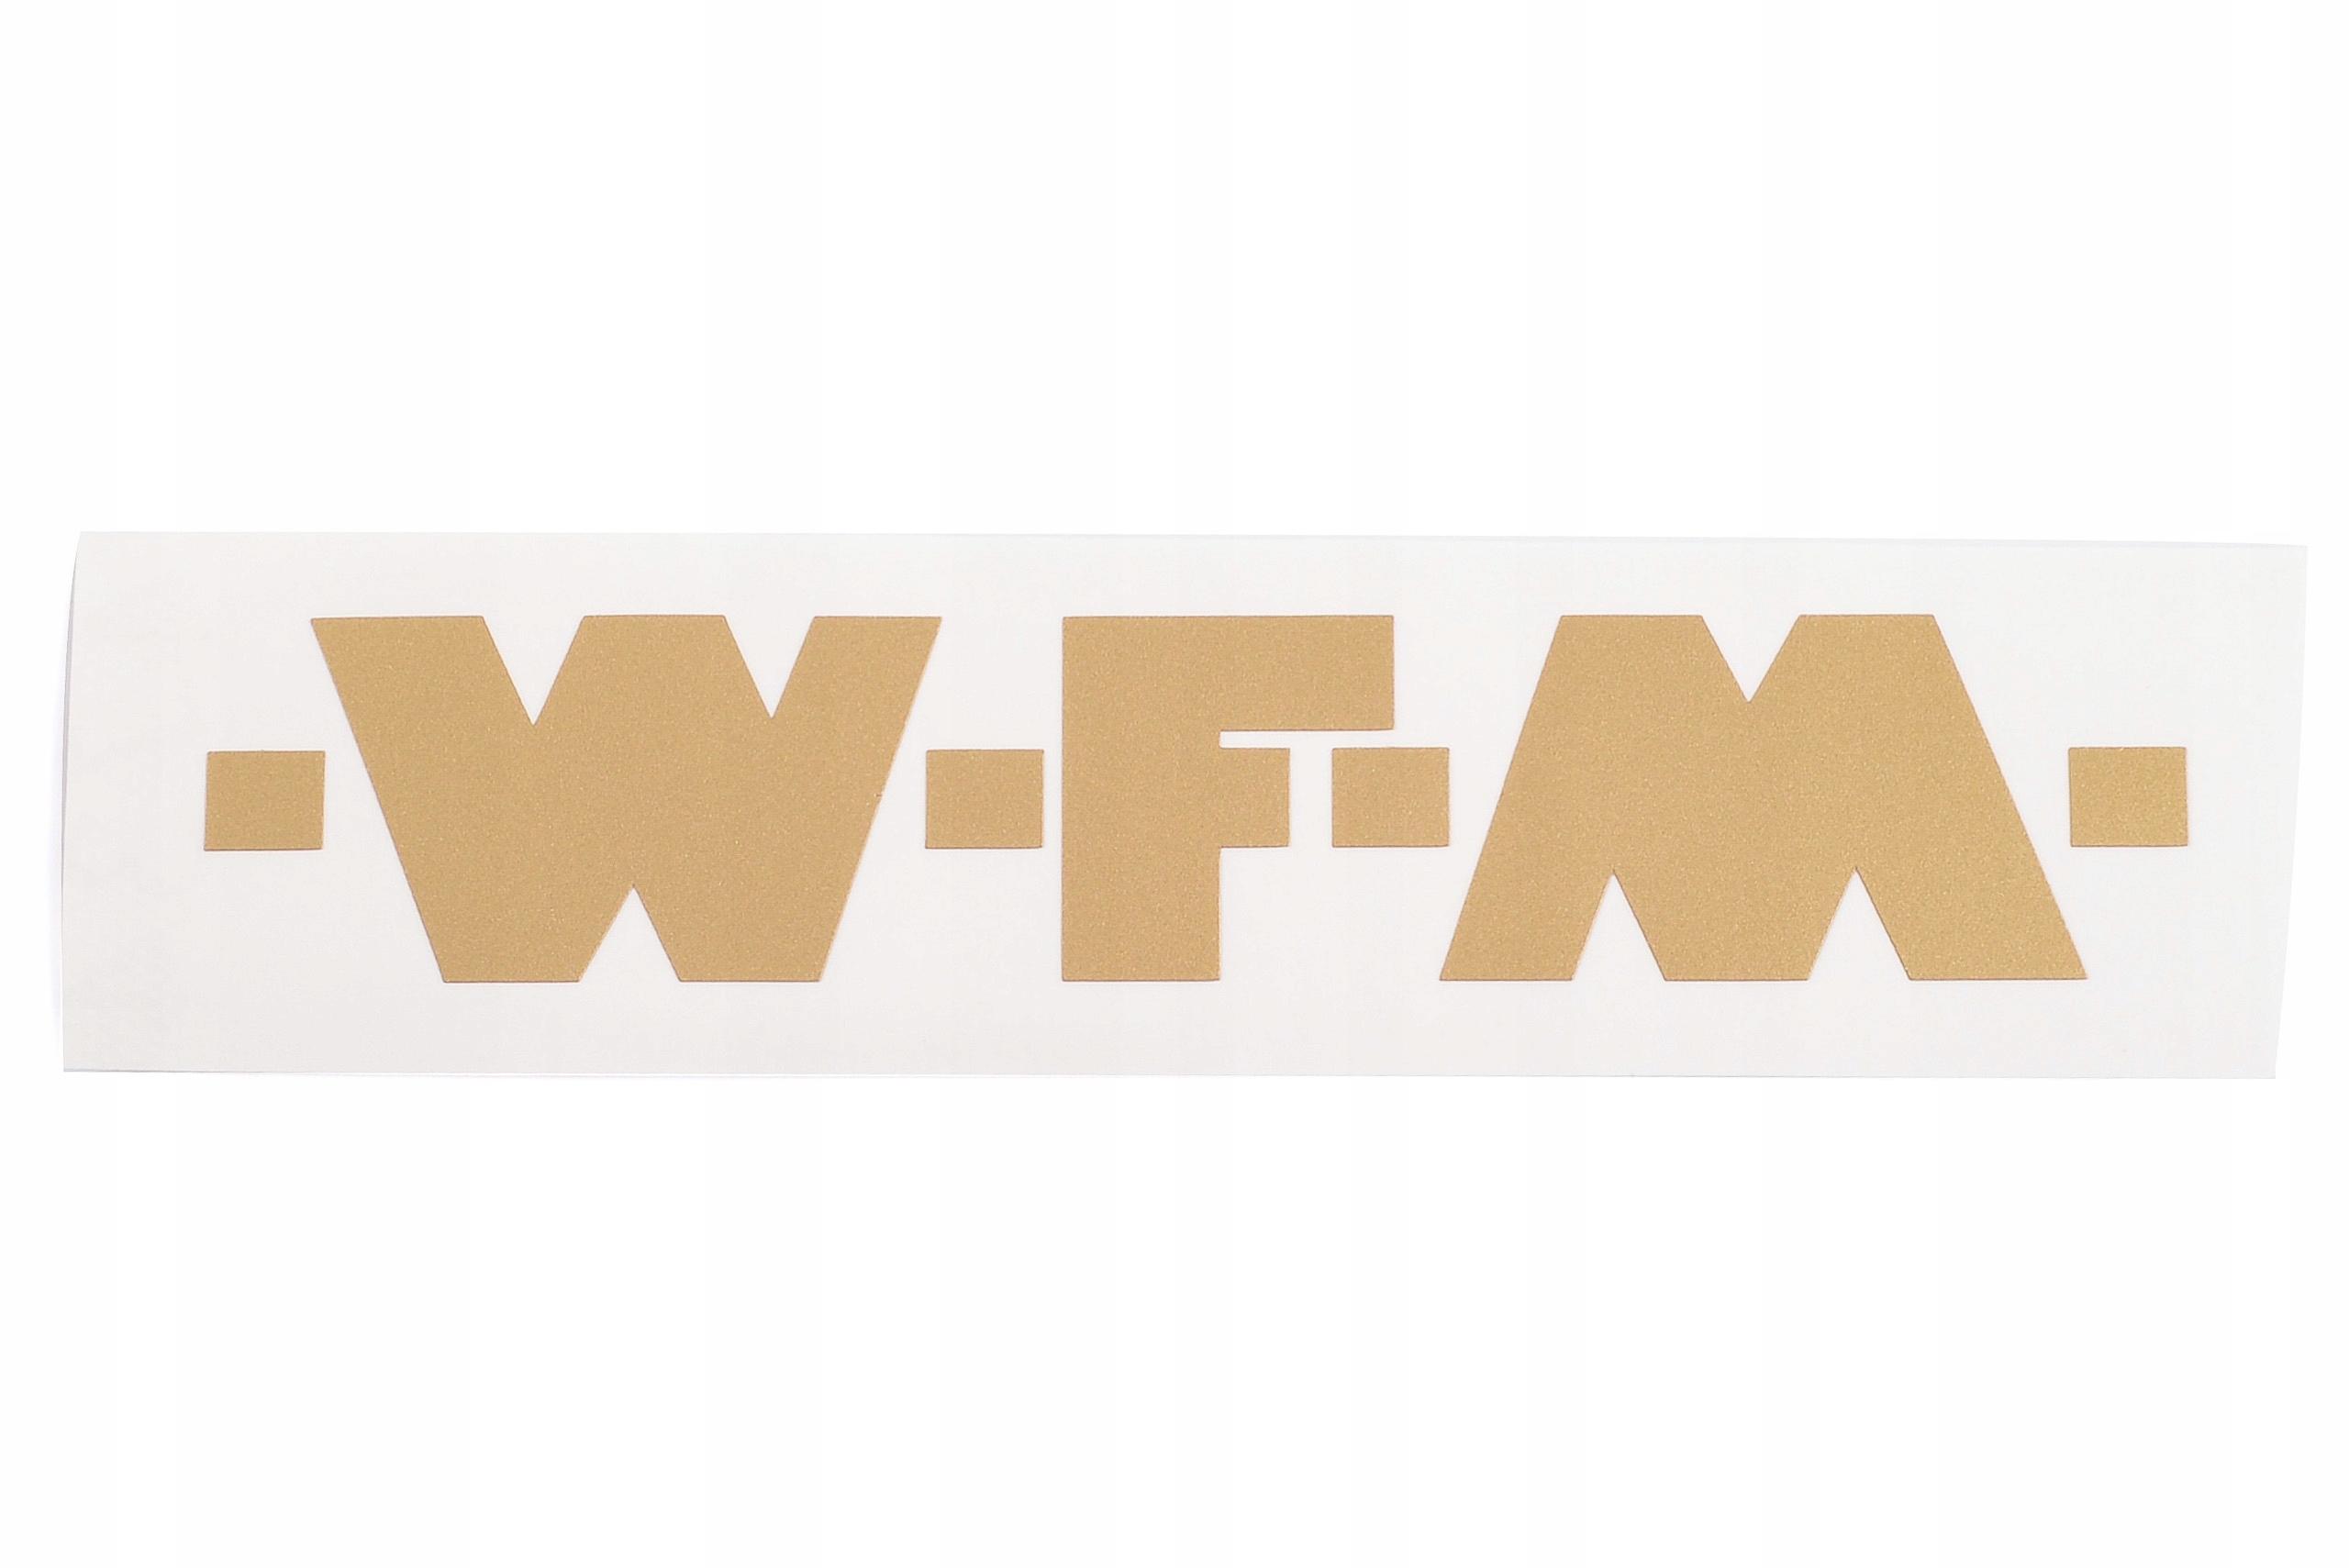 WFM M06 125 STICKER TANK FUEL THE TANK GOLD